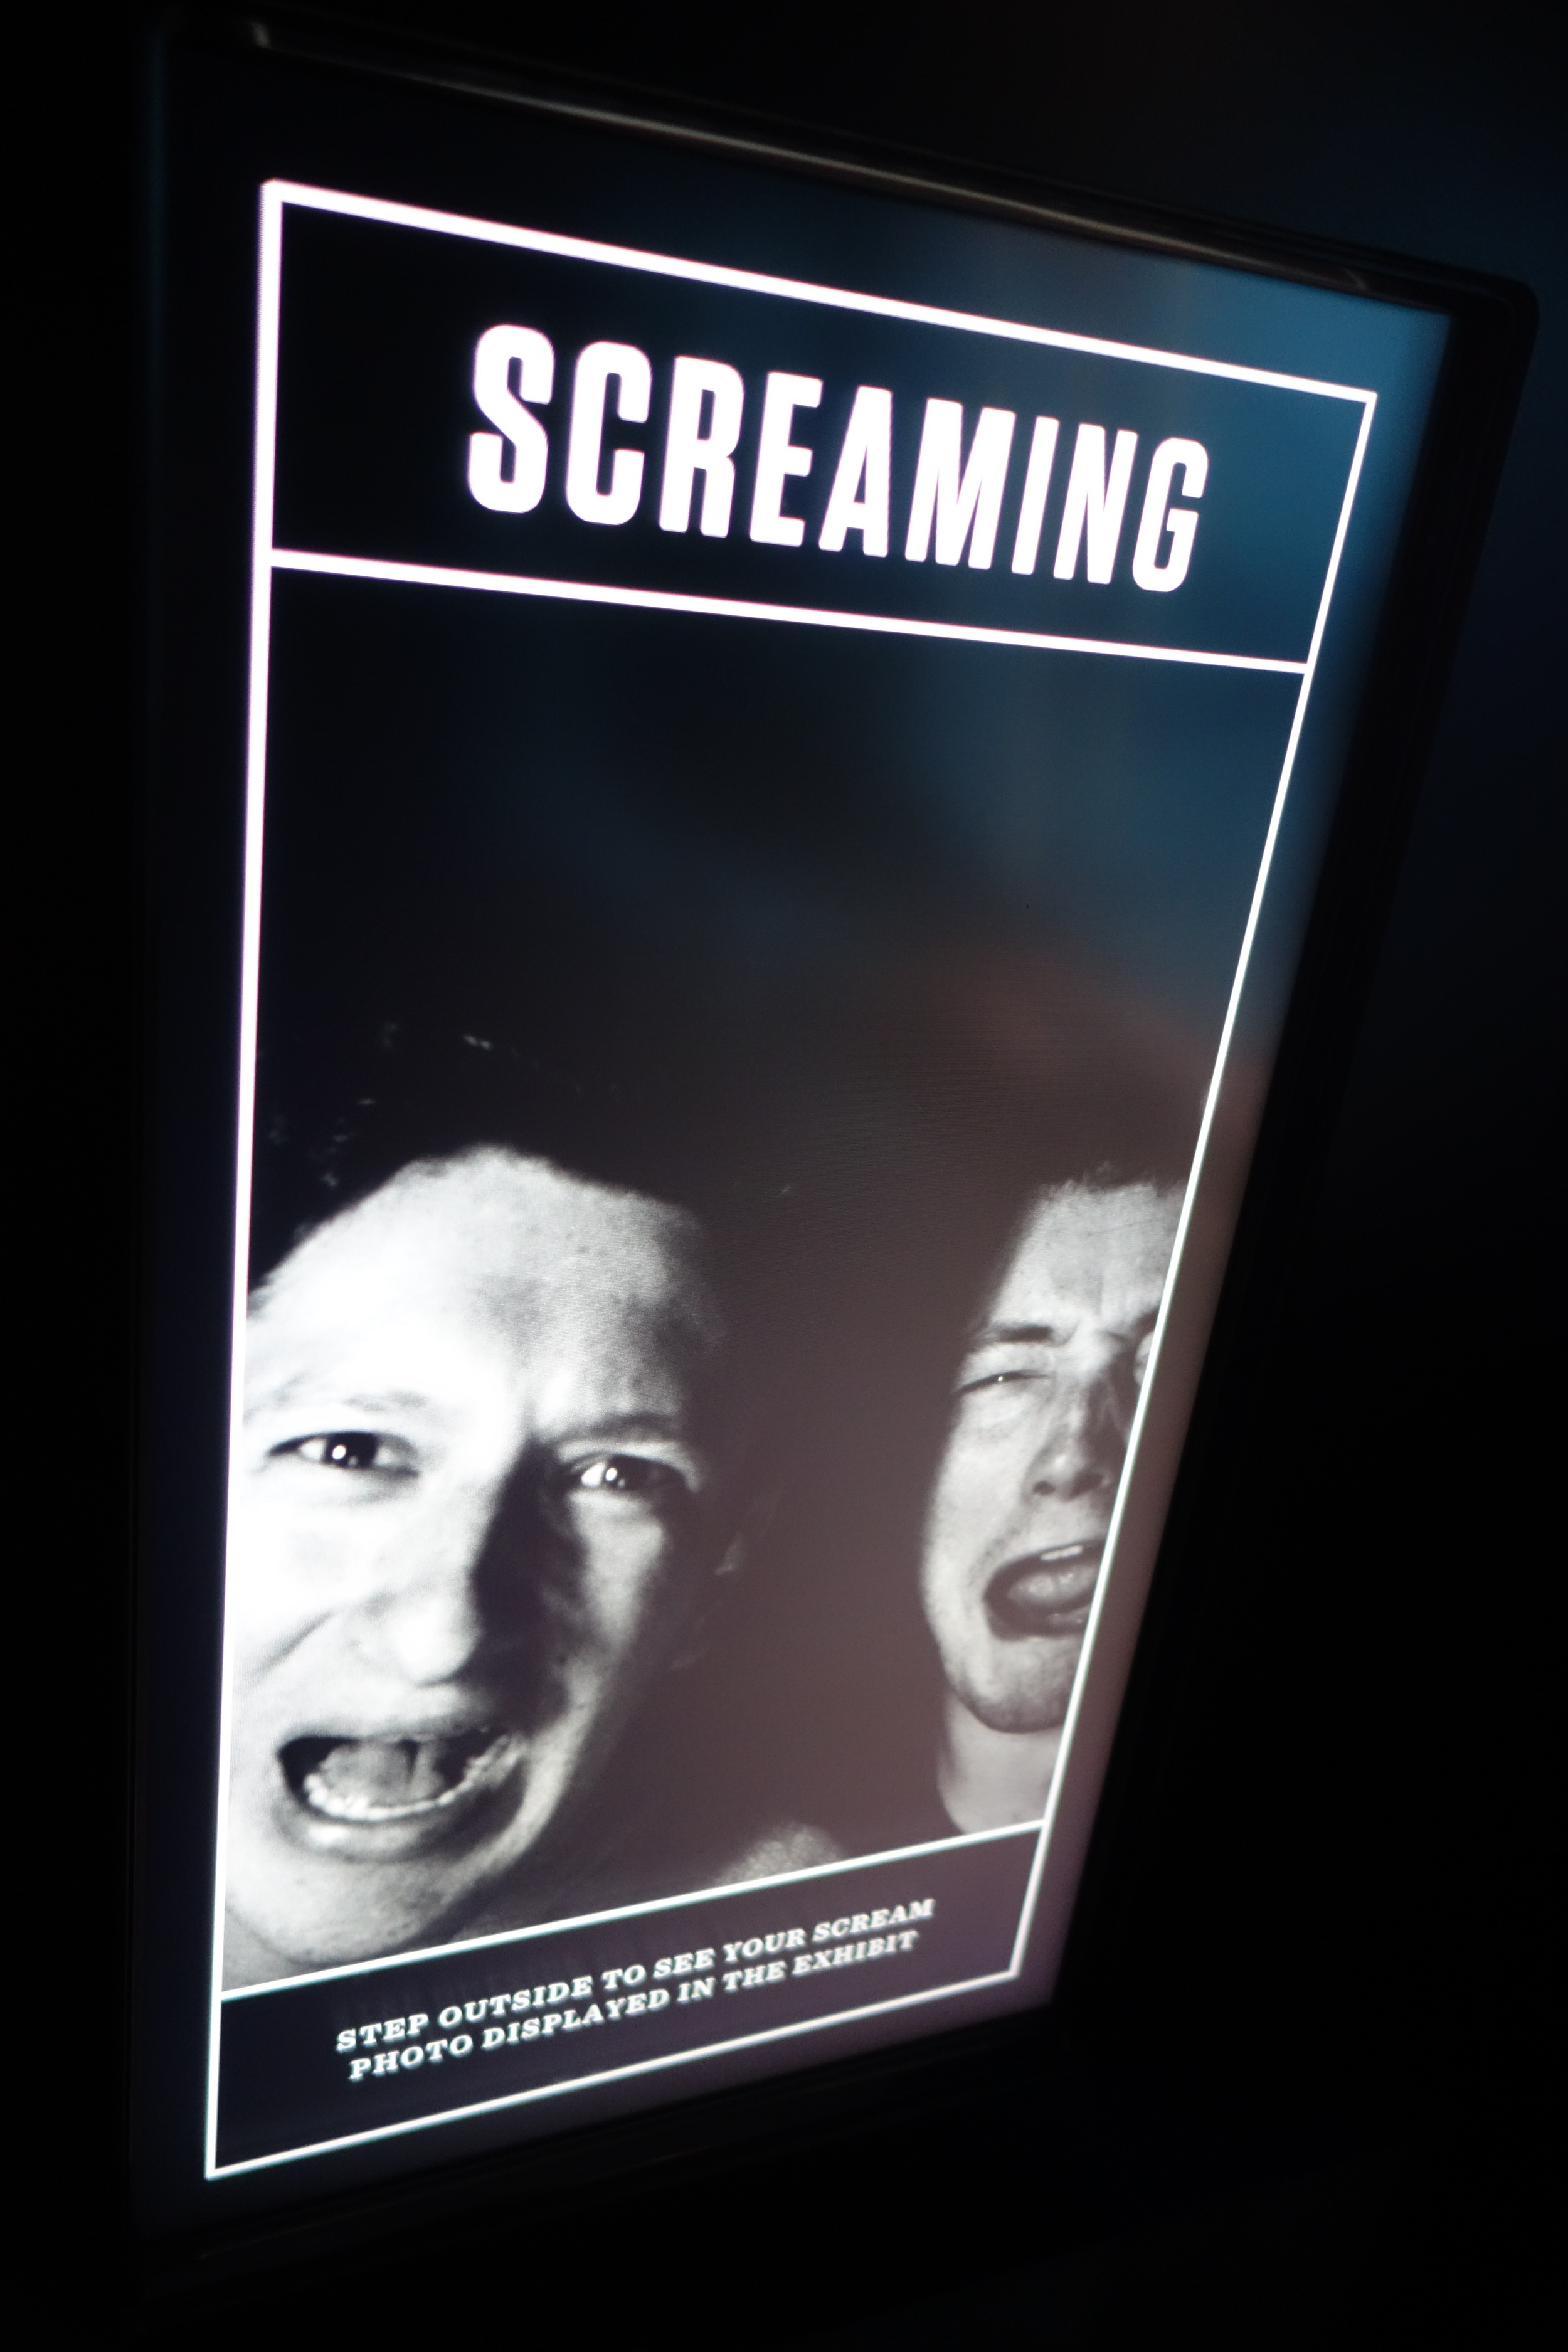 DSC00953 Screaming with Richard.JPG